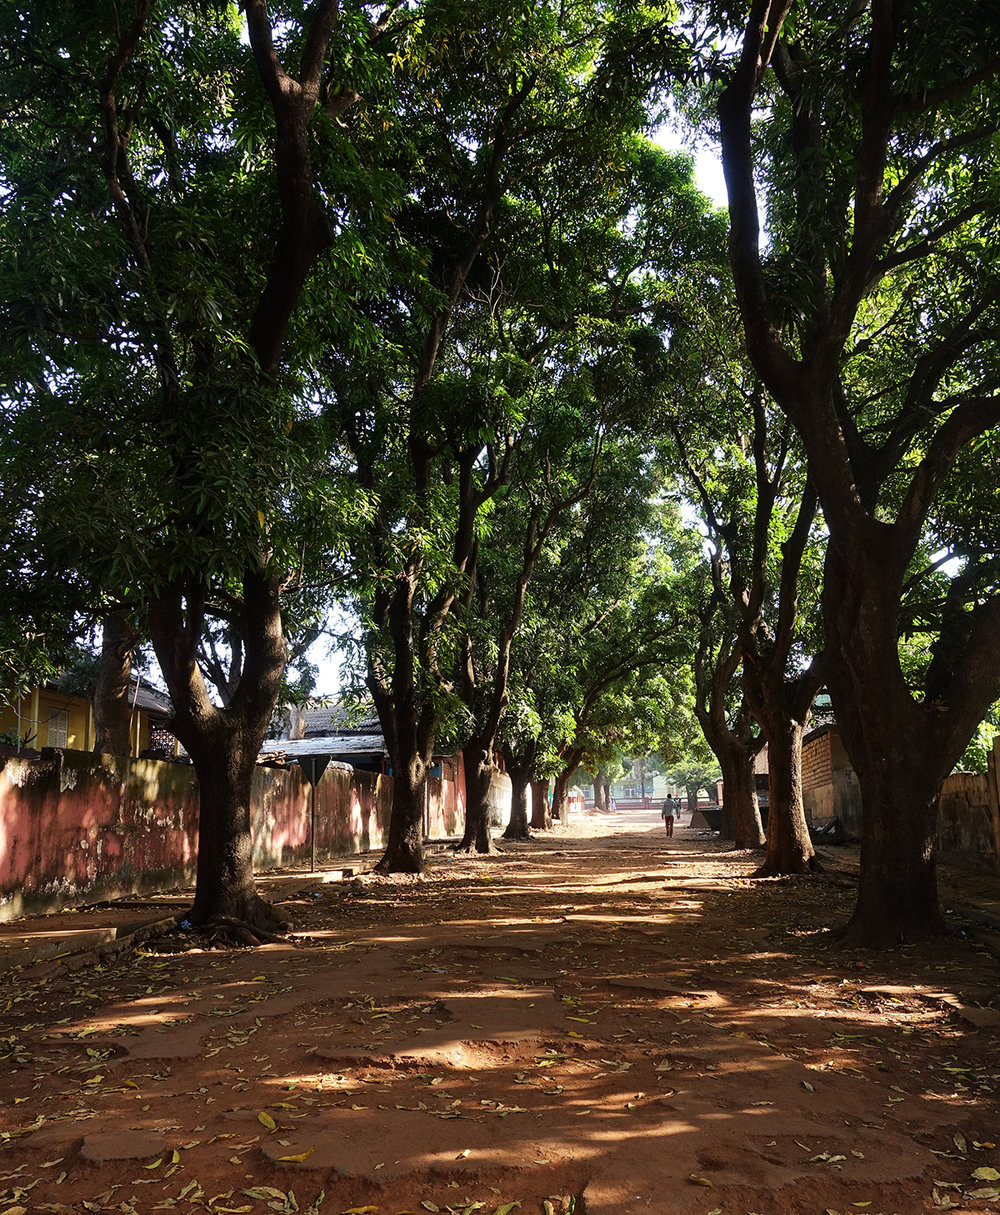 #streetsofbissau mangostrees in Bissau